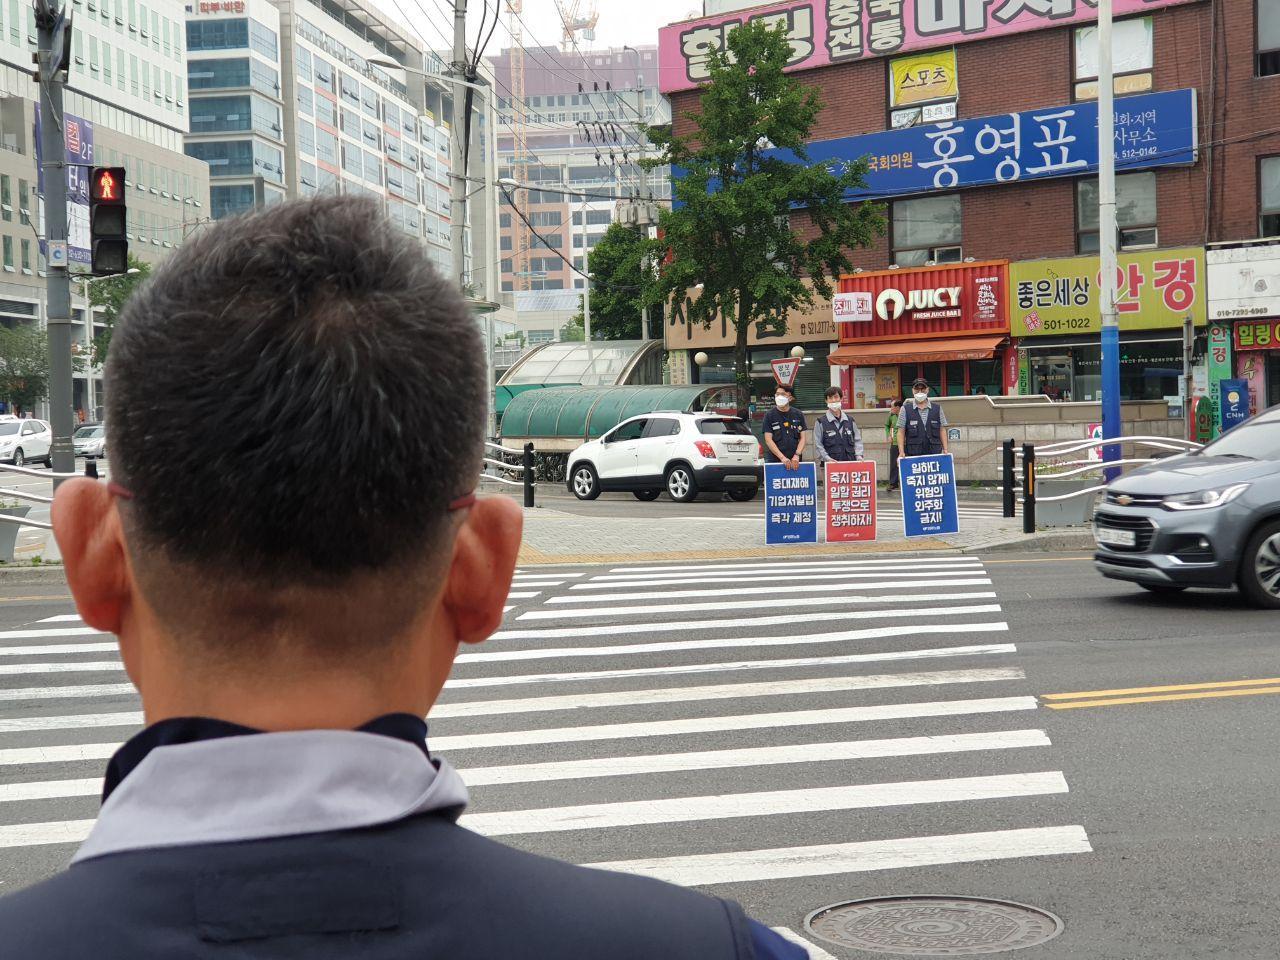 photo_2020-06-18_07-49-09.jpg